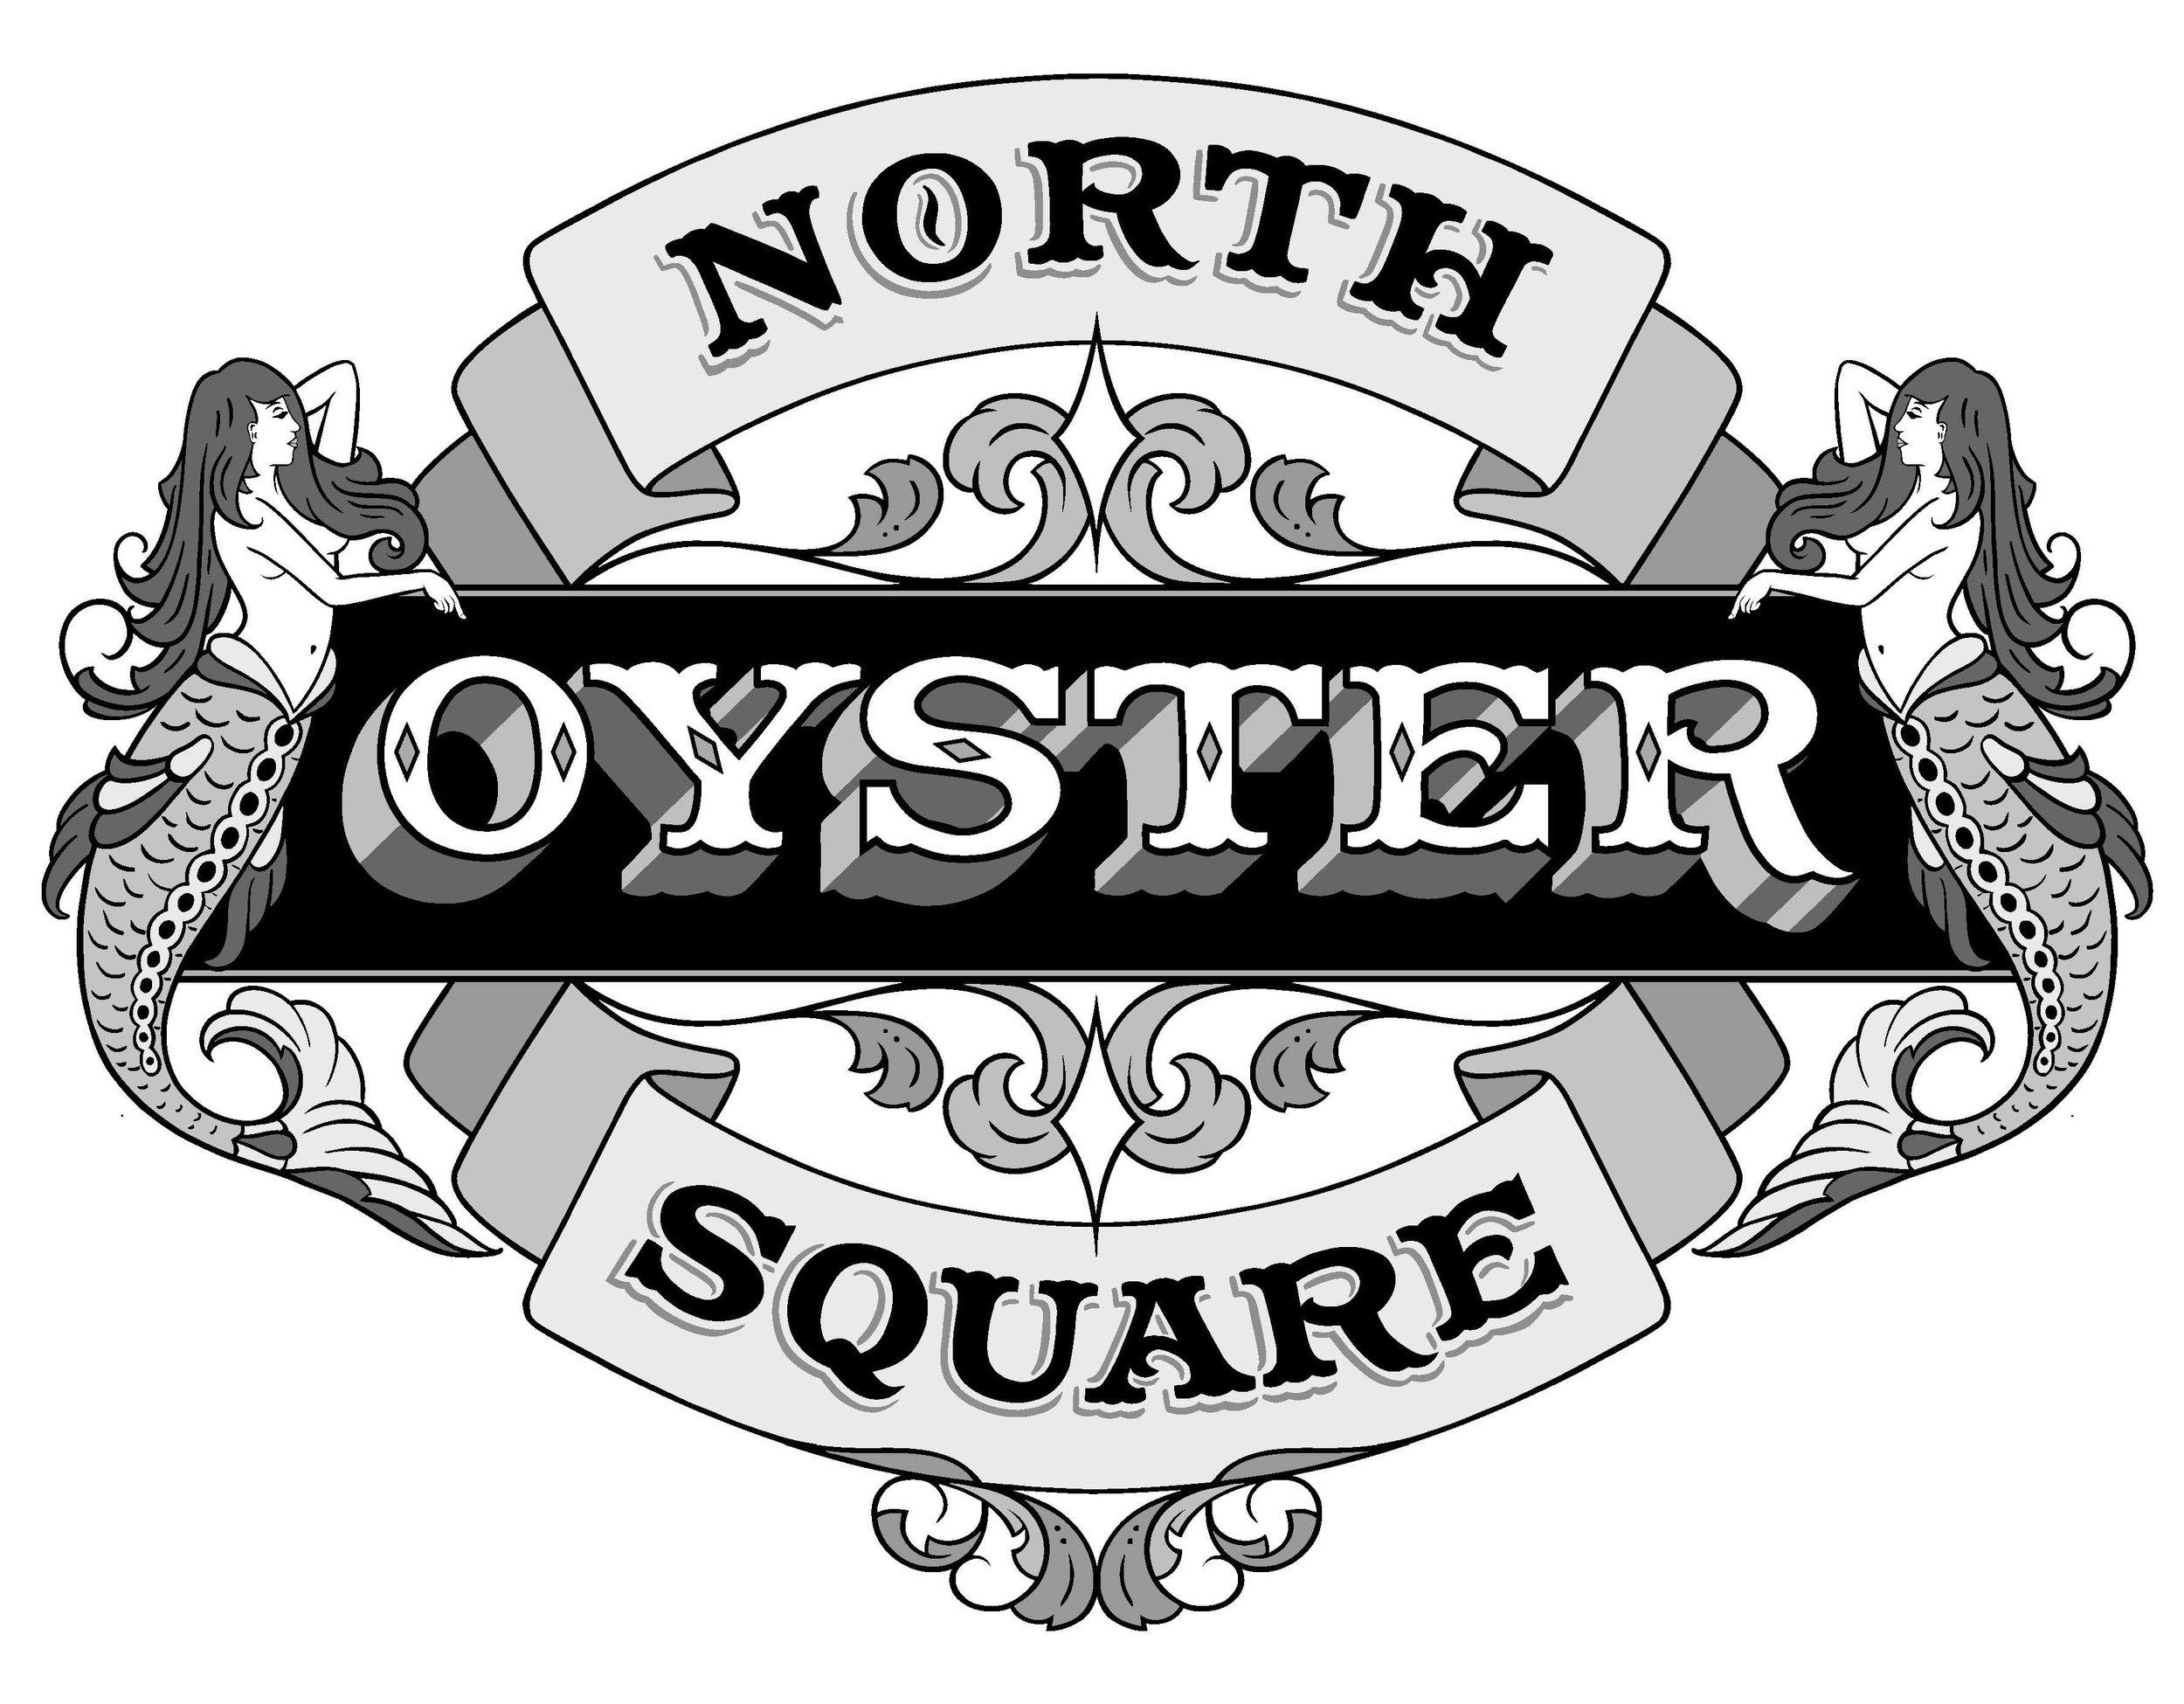 northsquareoyster.jpg